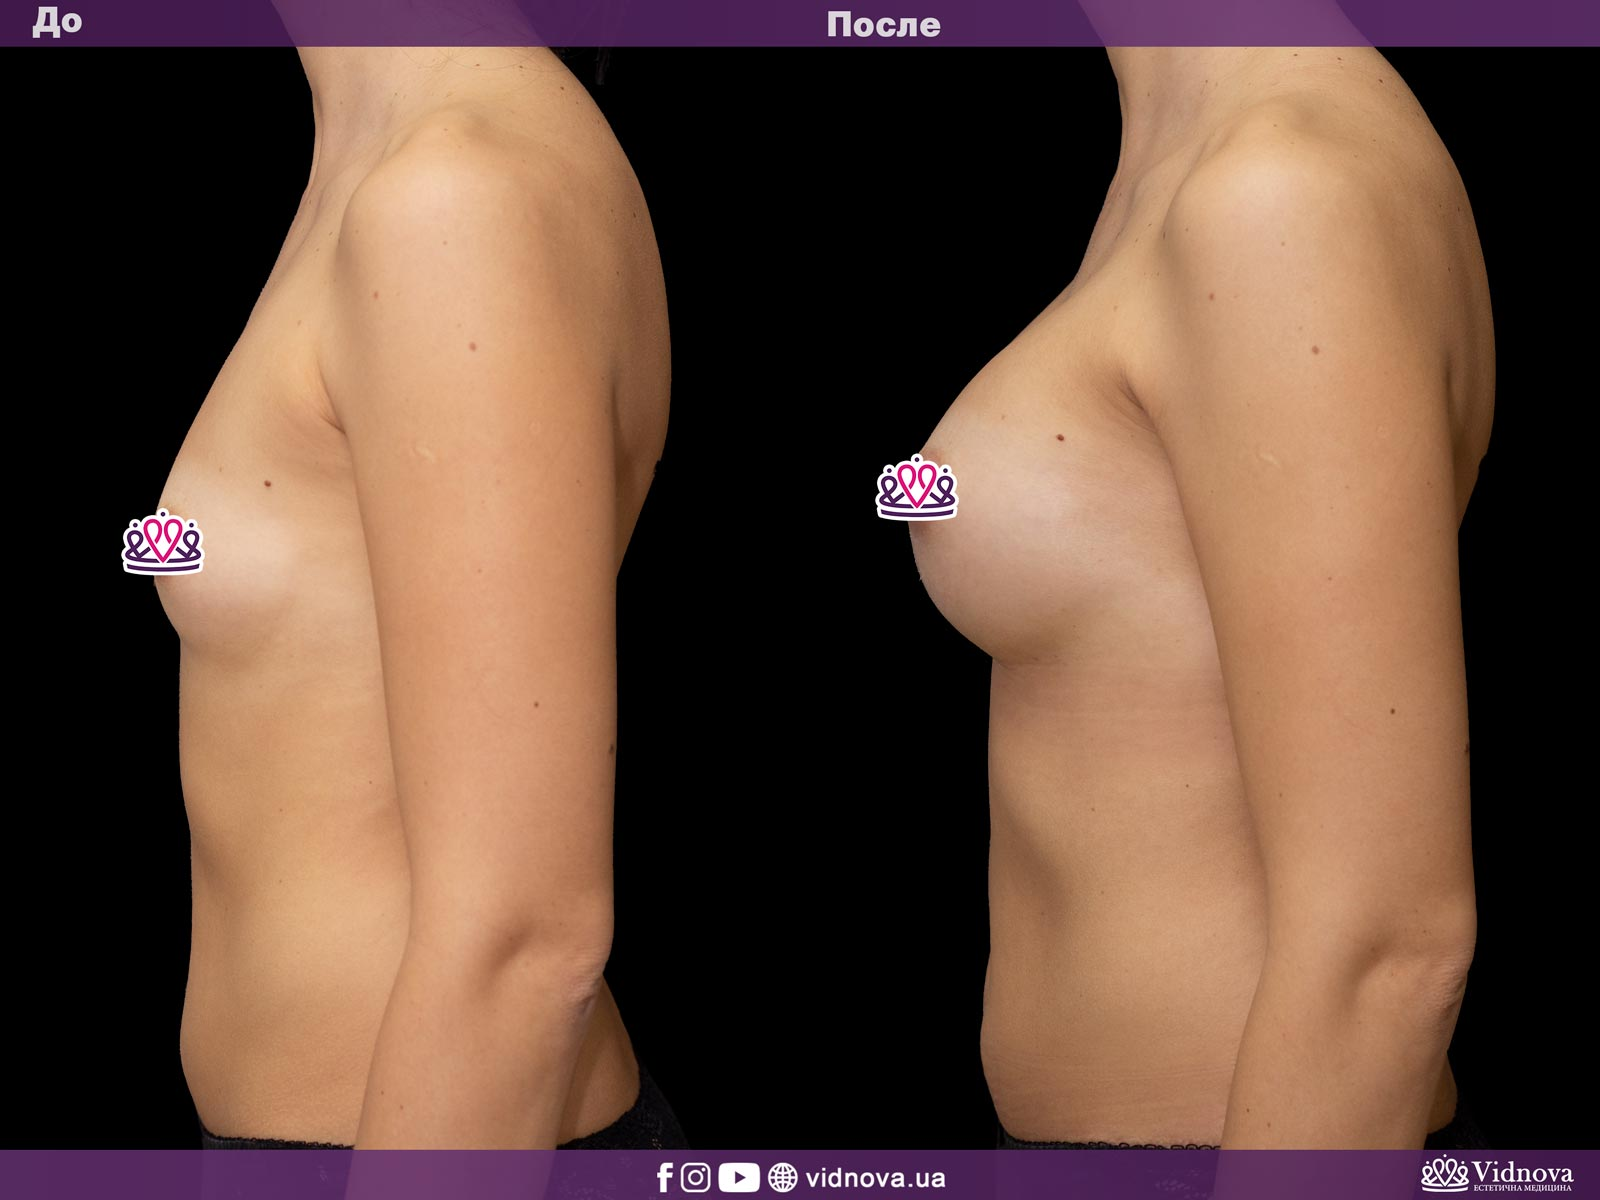 Увеличение груди: Фото ДО и ПОСЛЕ - Пример №27-3 - Клиника Vidnova